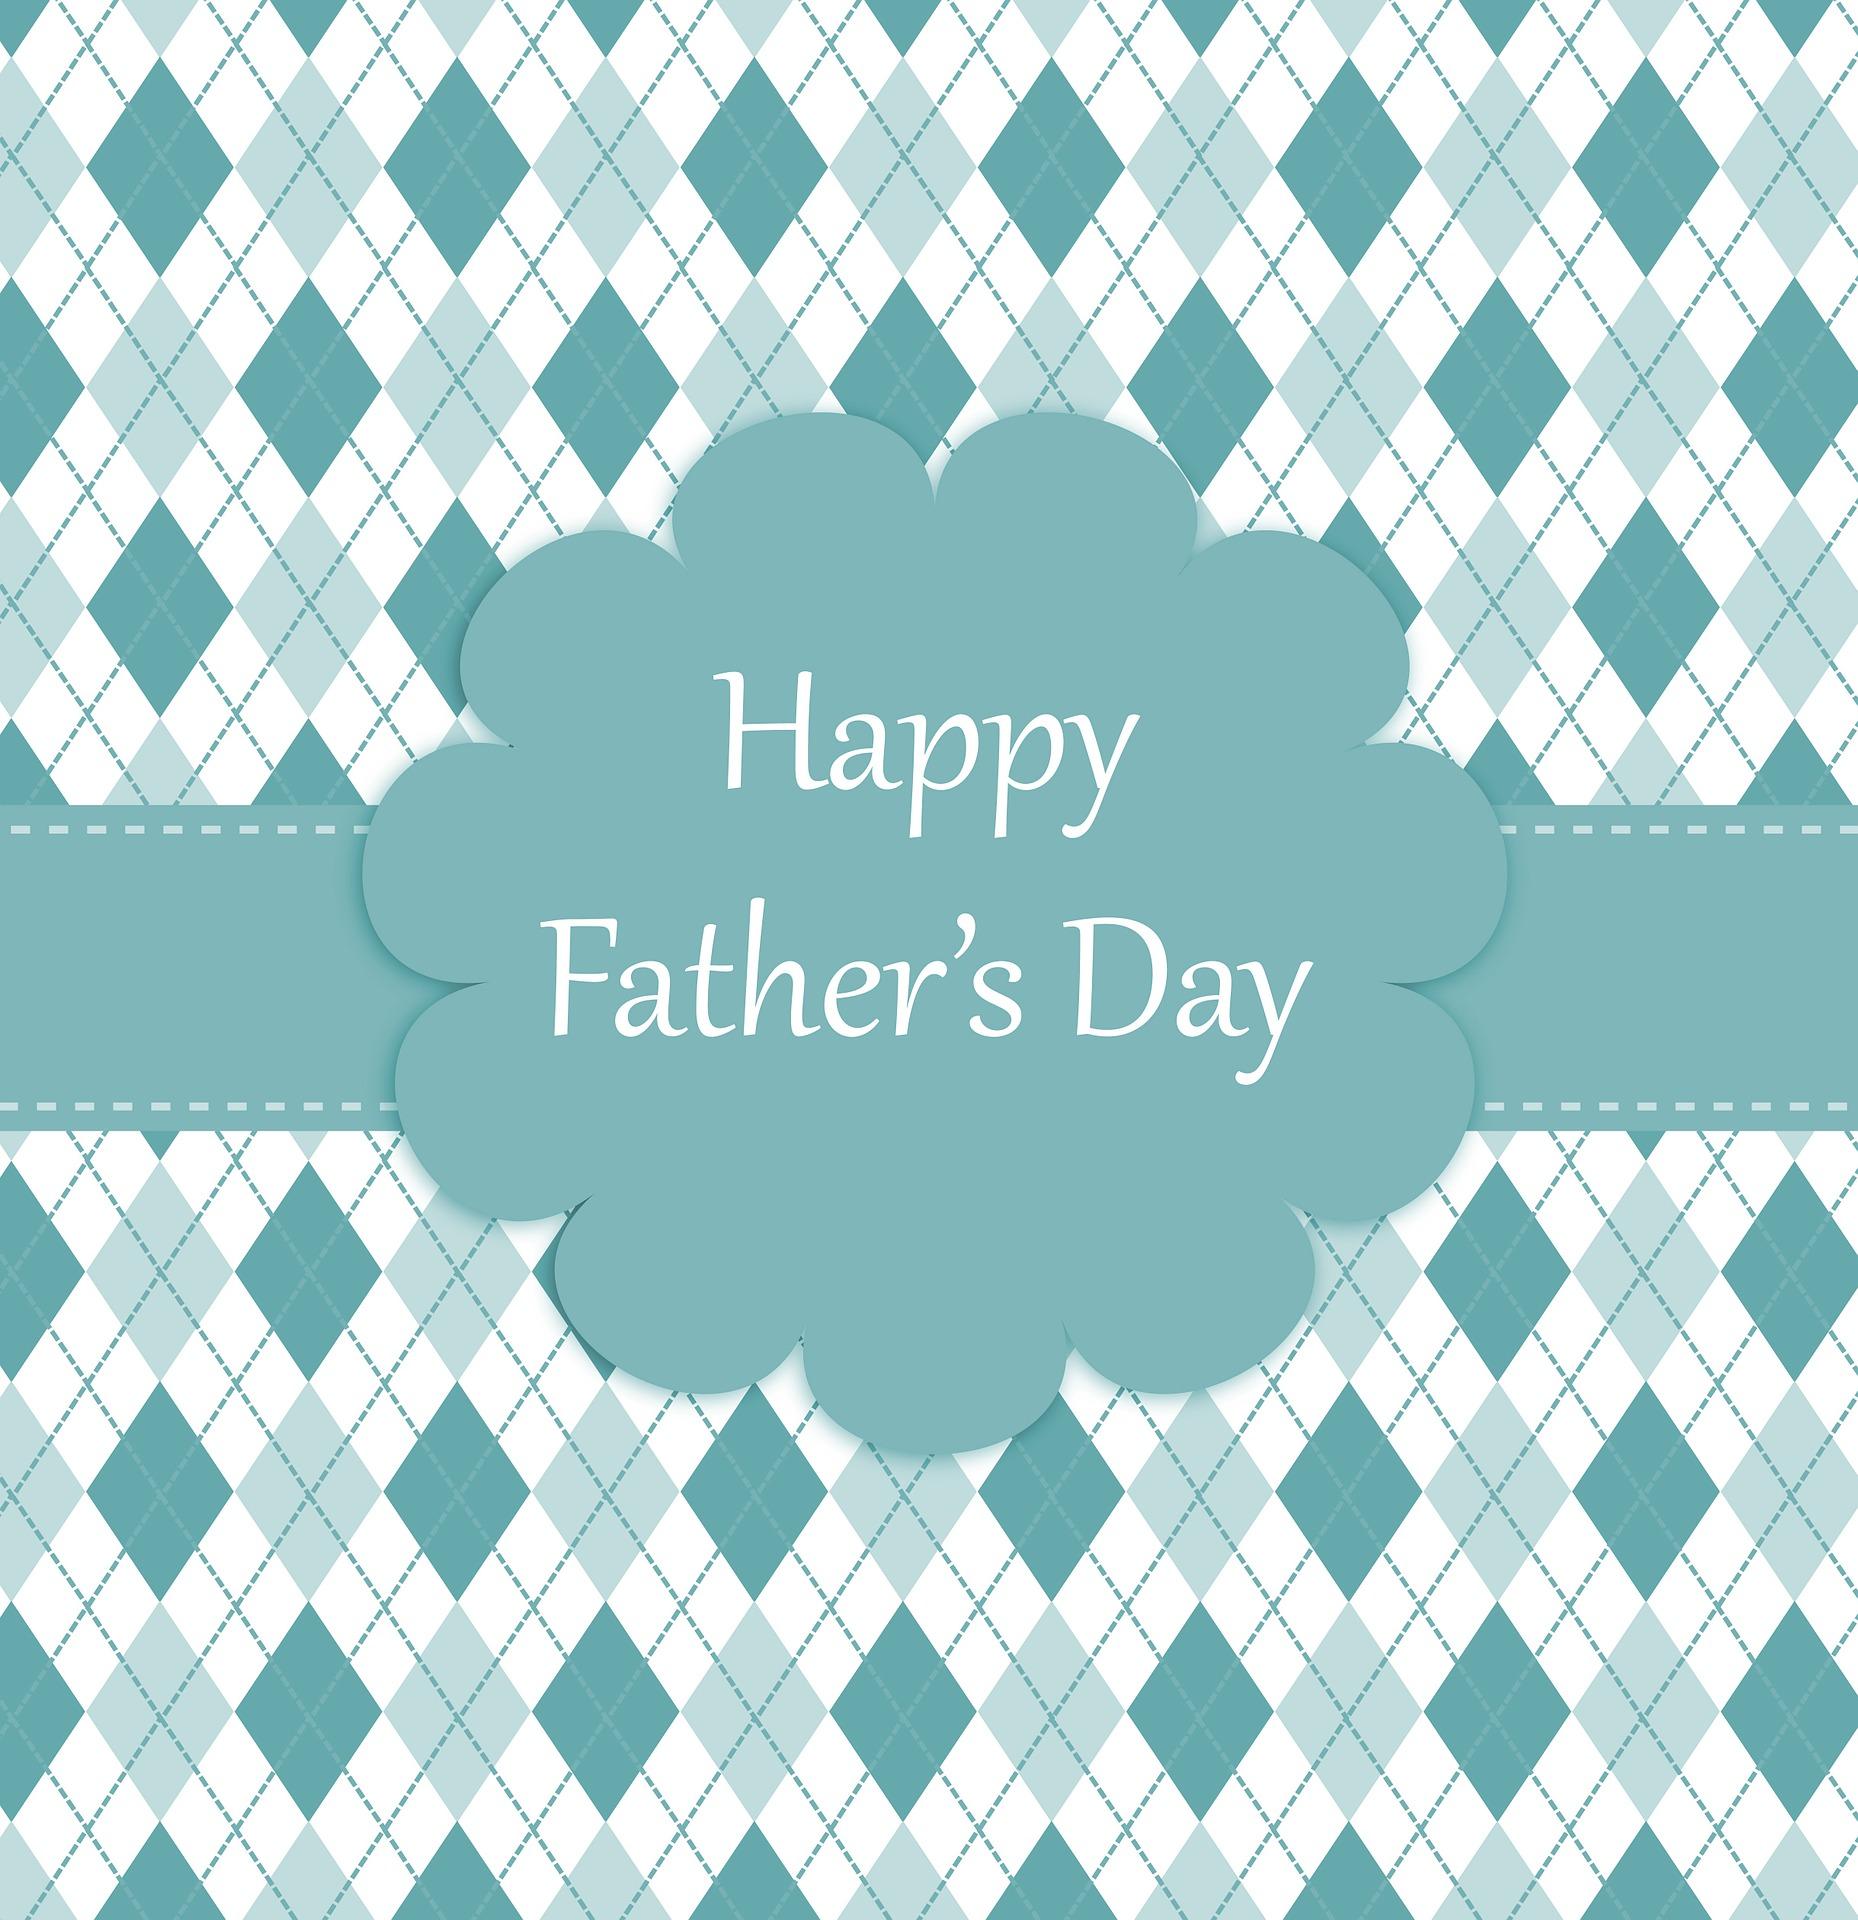 Fathers Day Event Doris Miller 6.16.18.jpg